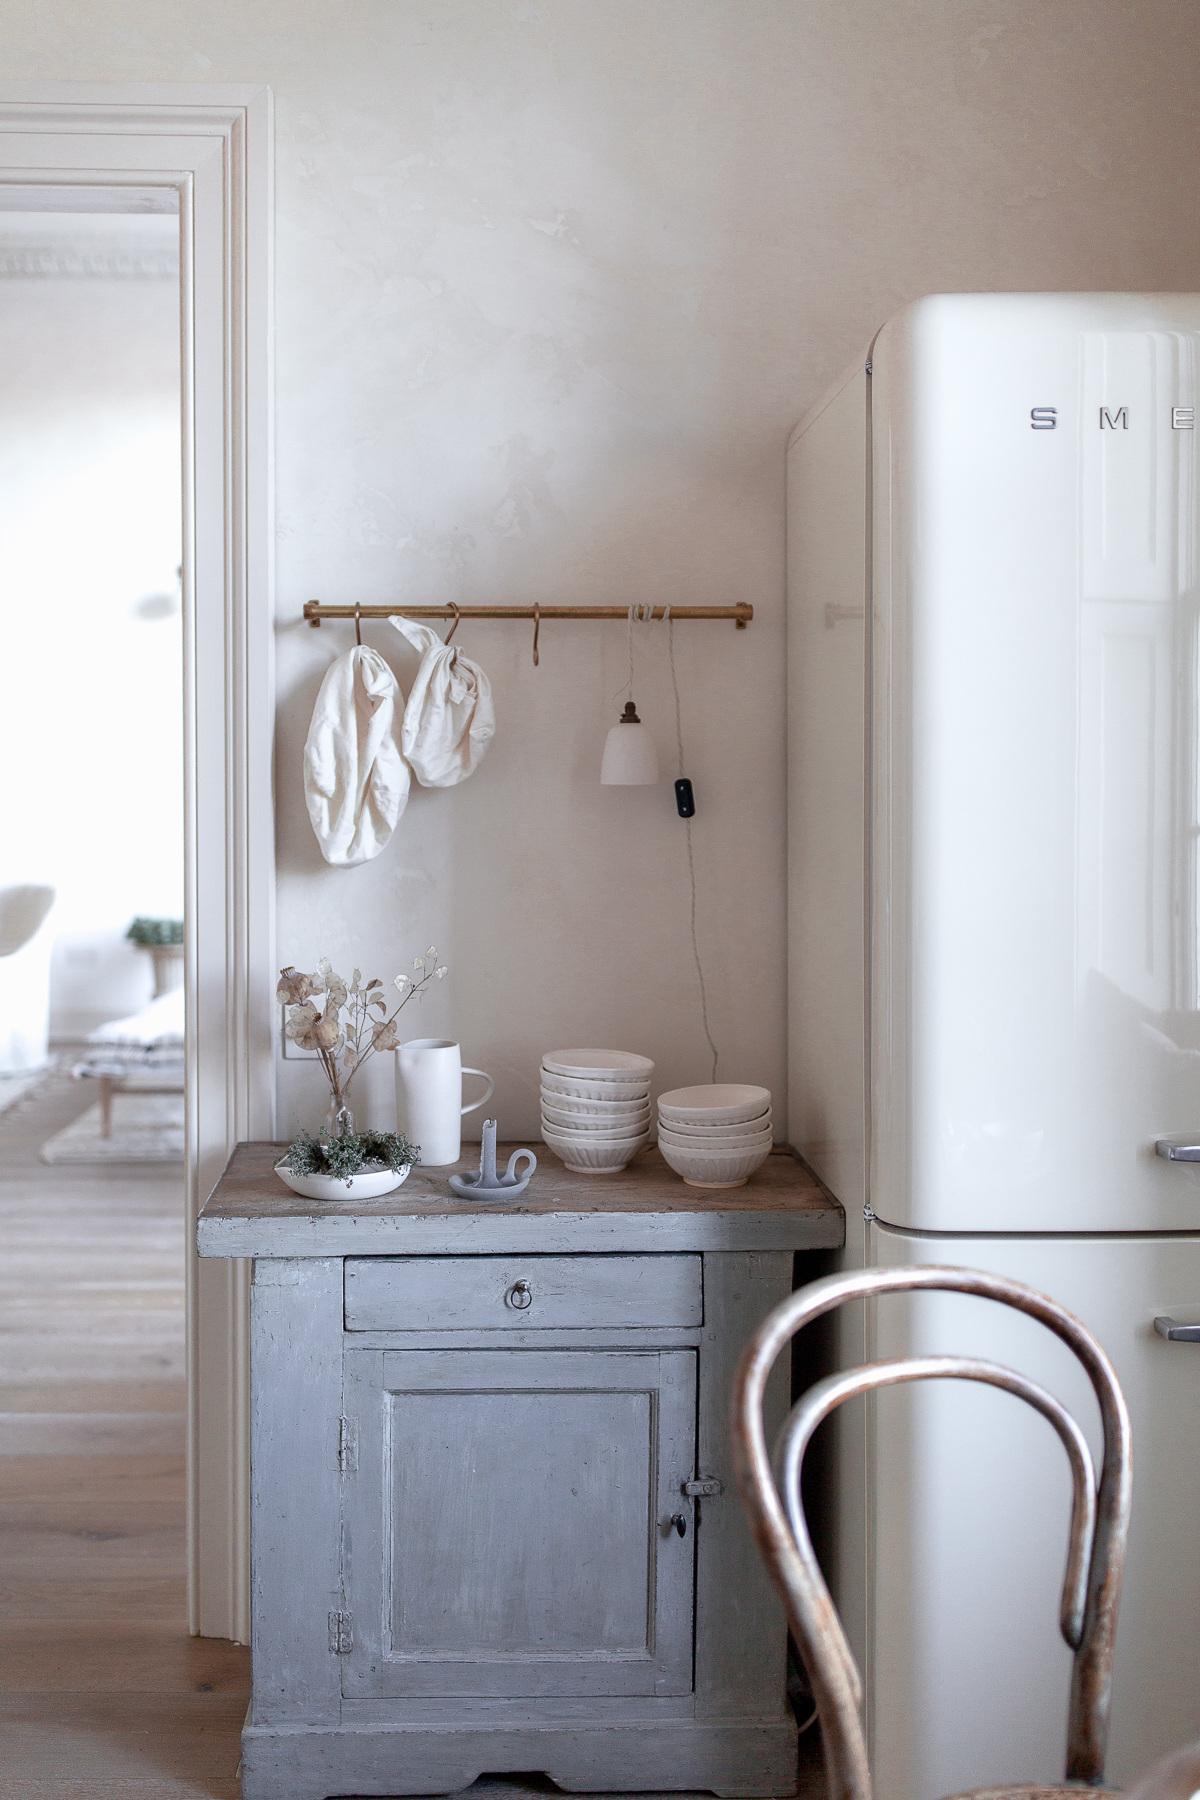 The Nordroom - The Beautiful Edinburgh Home of Ingredients LDN Founder Nina Plummer